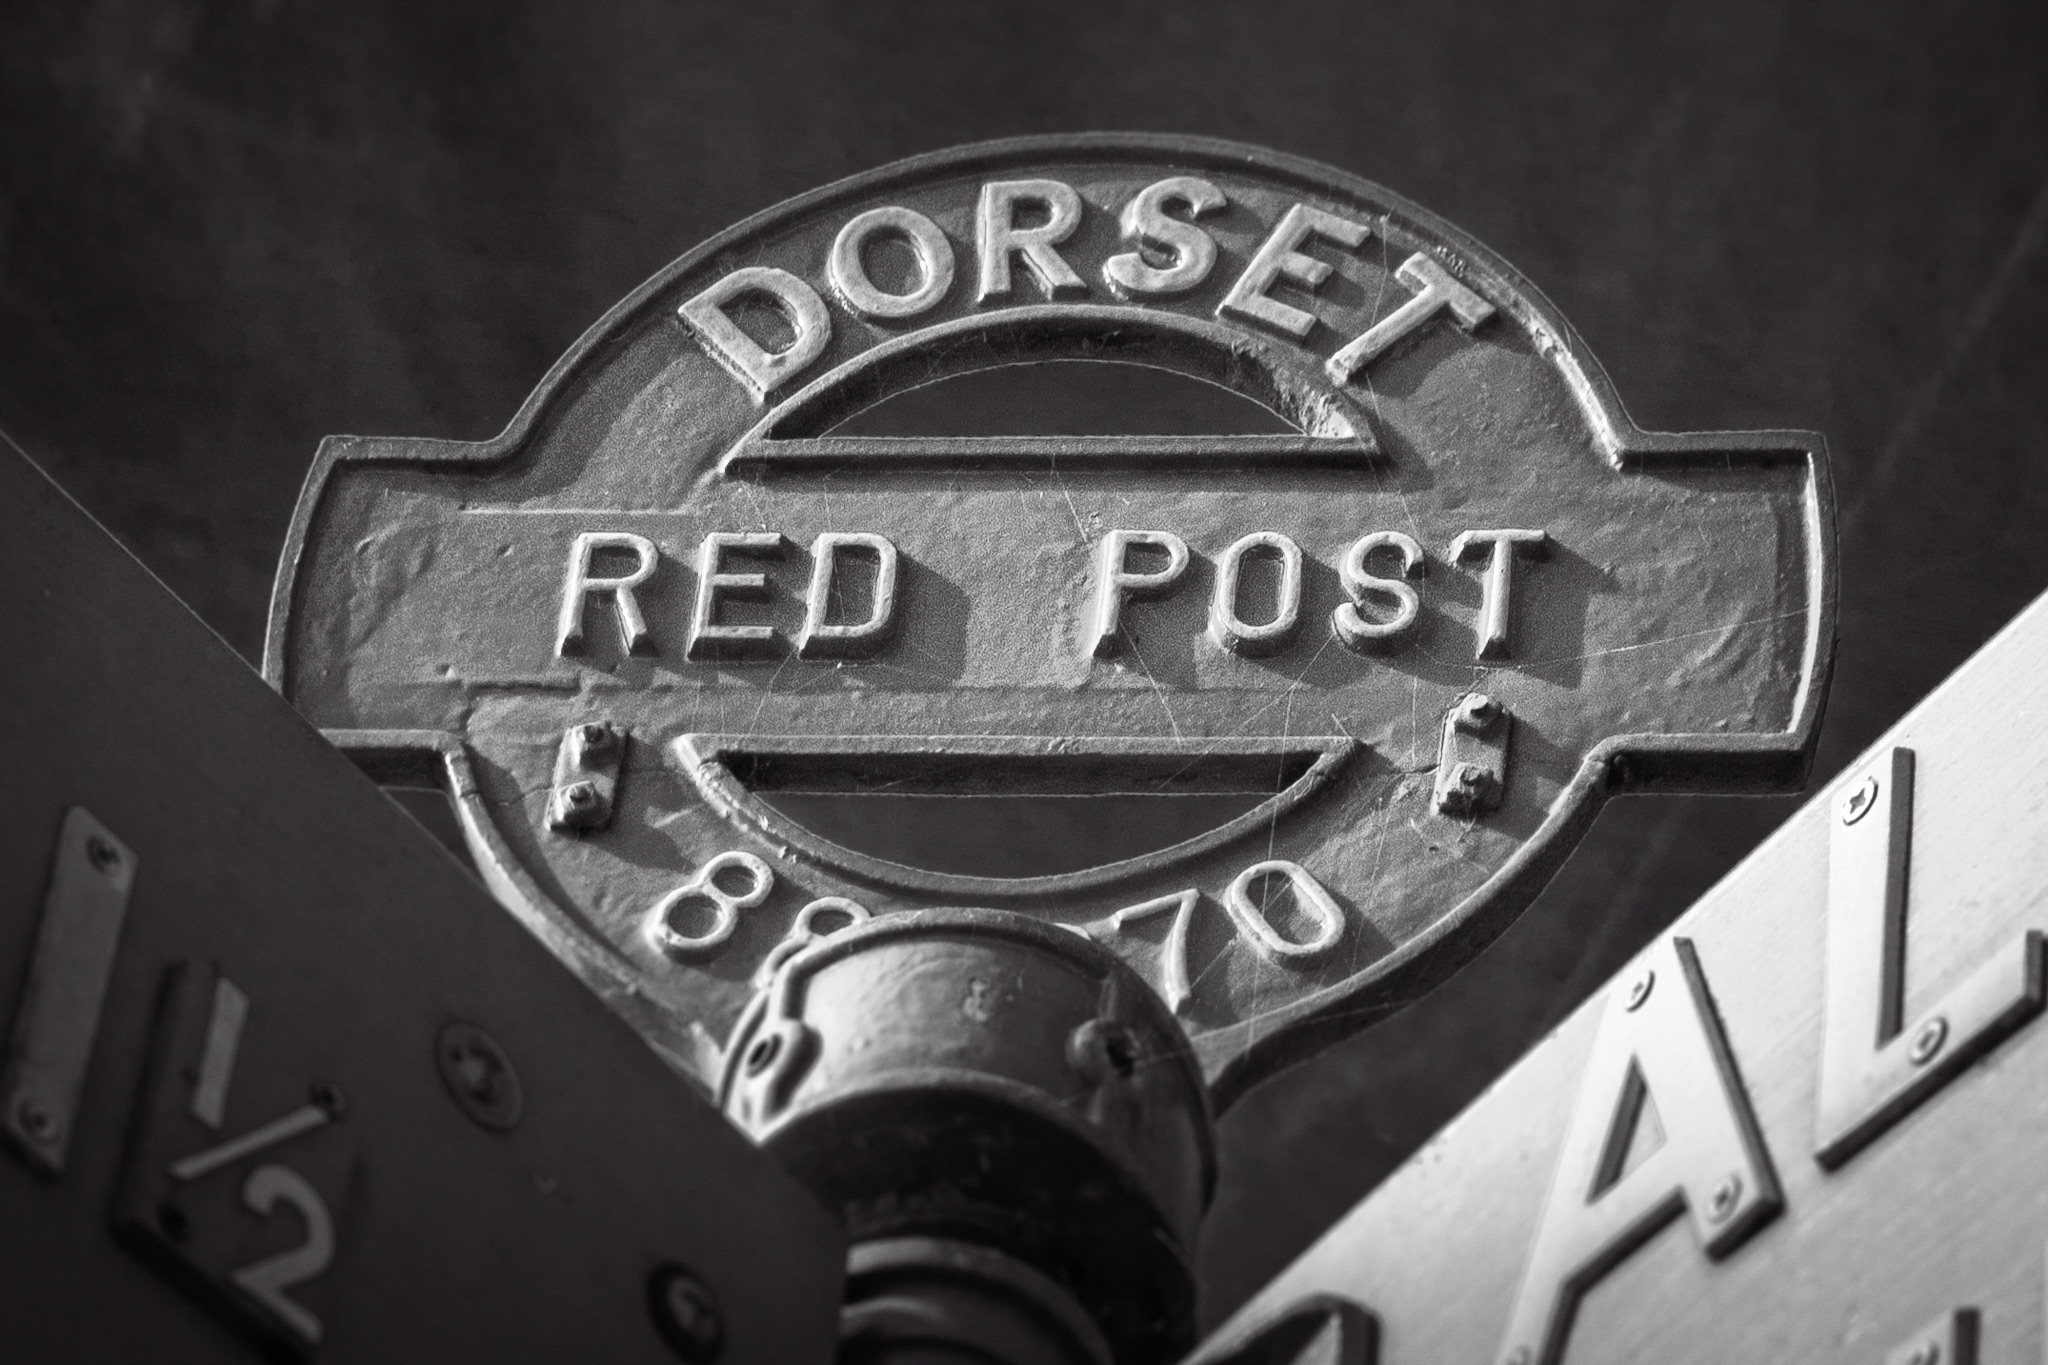 Dorset Red Post by Rick McEvoy - Photographer in Dorset